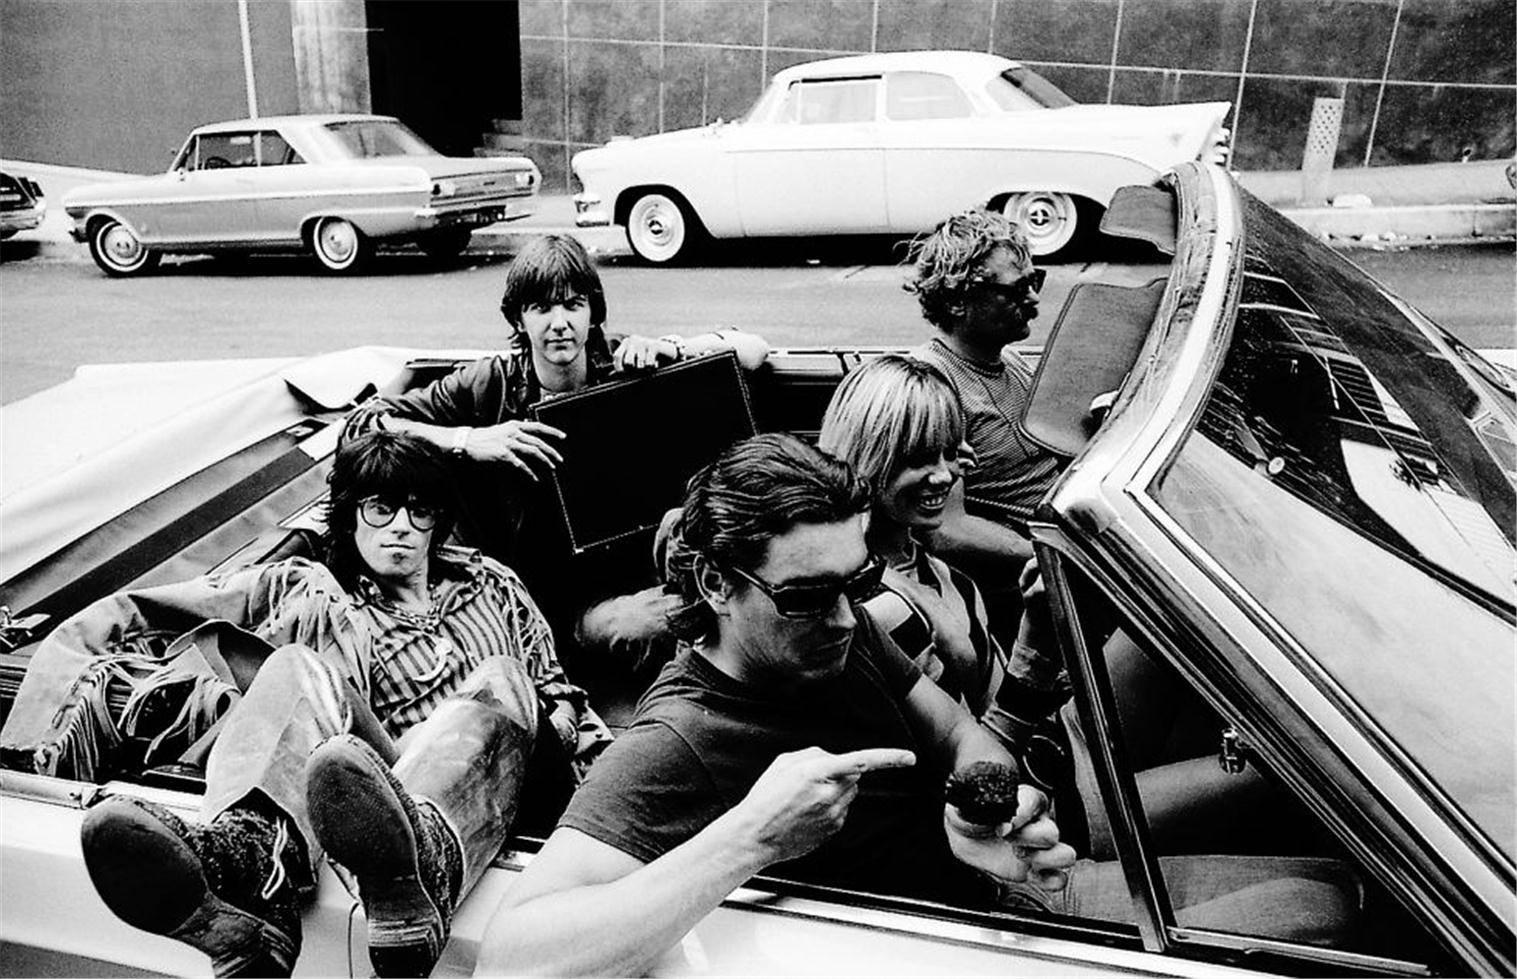 Keith Richards, Anita Pallenberg, Gram Parsons